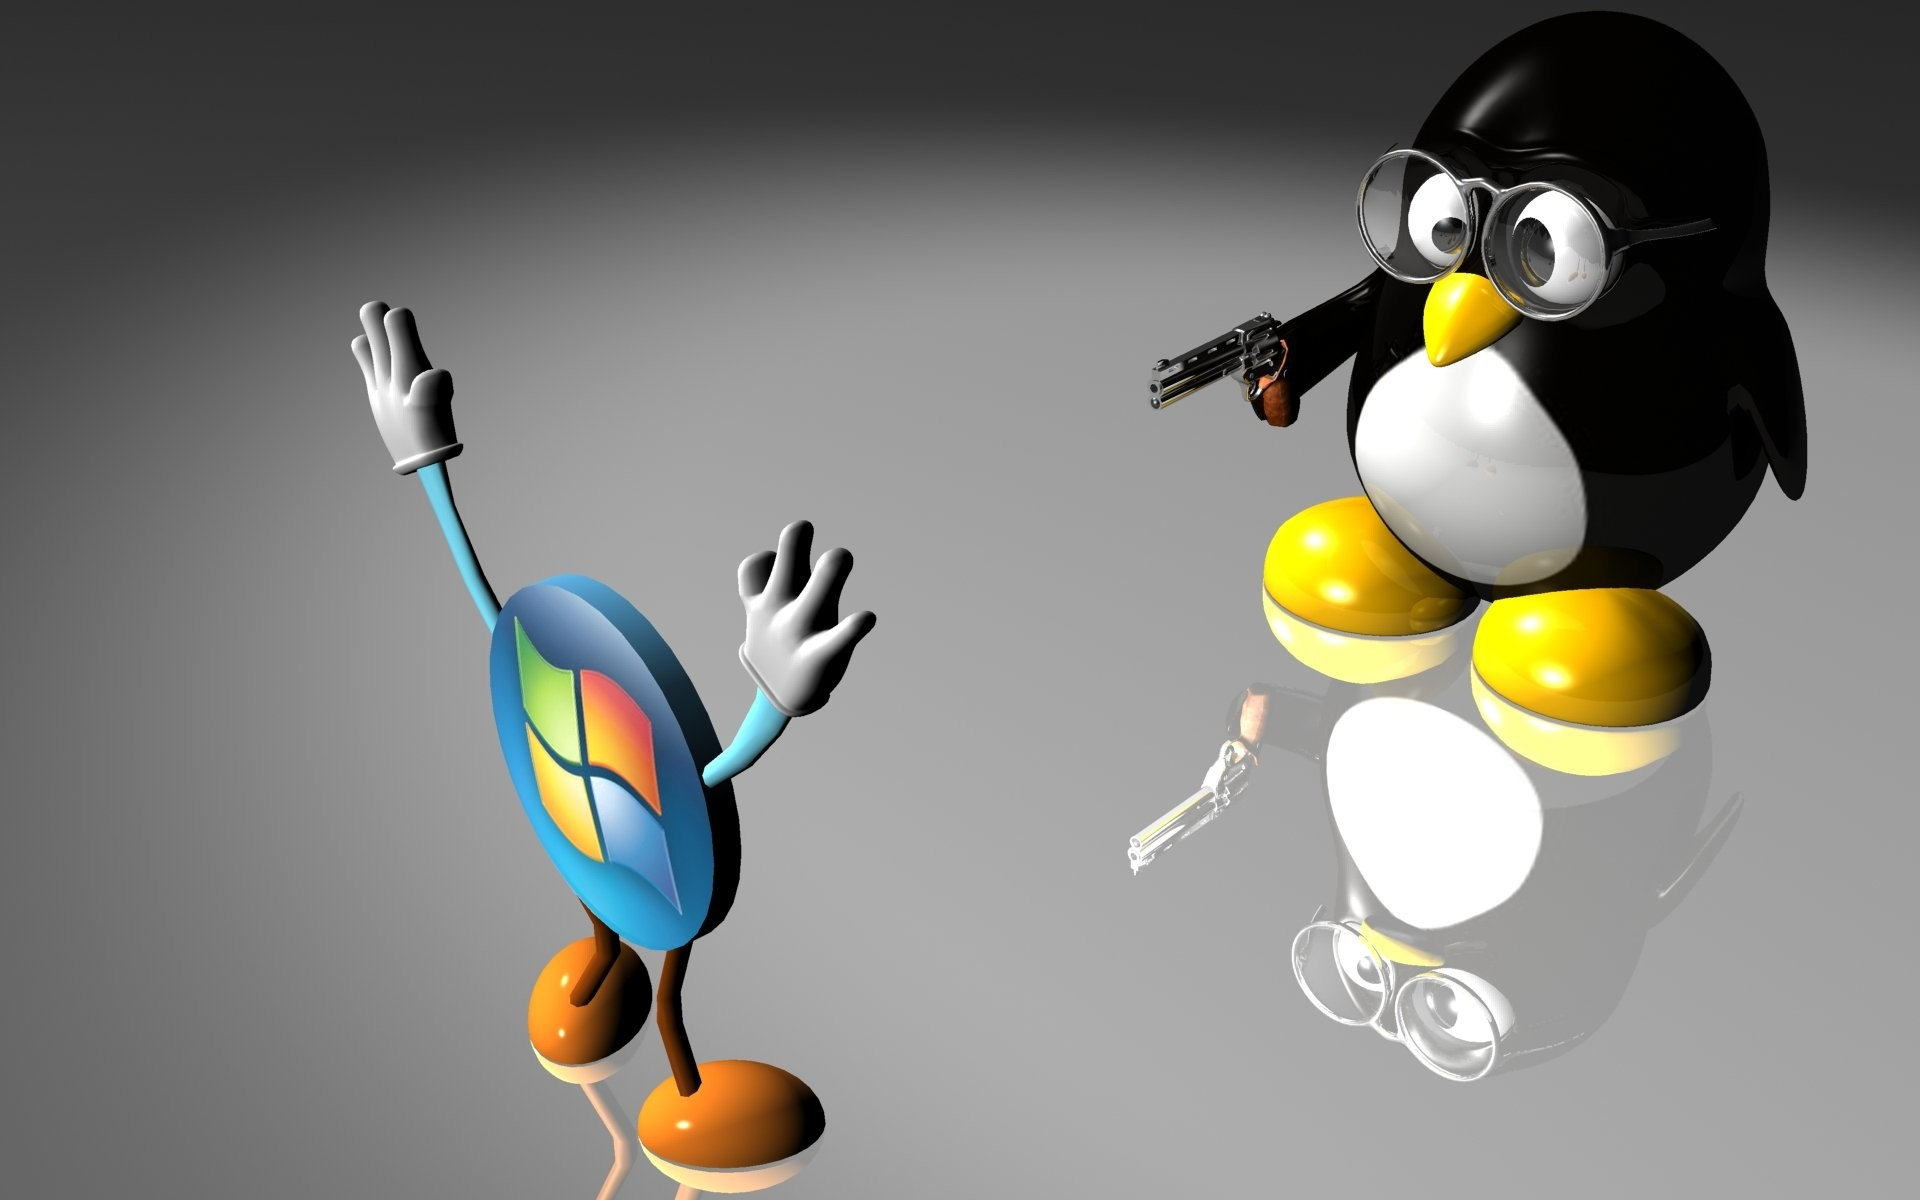 Linux Wallpaper 203288